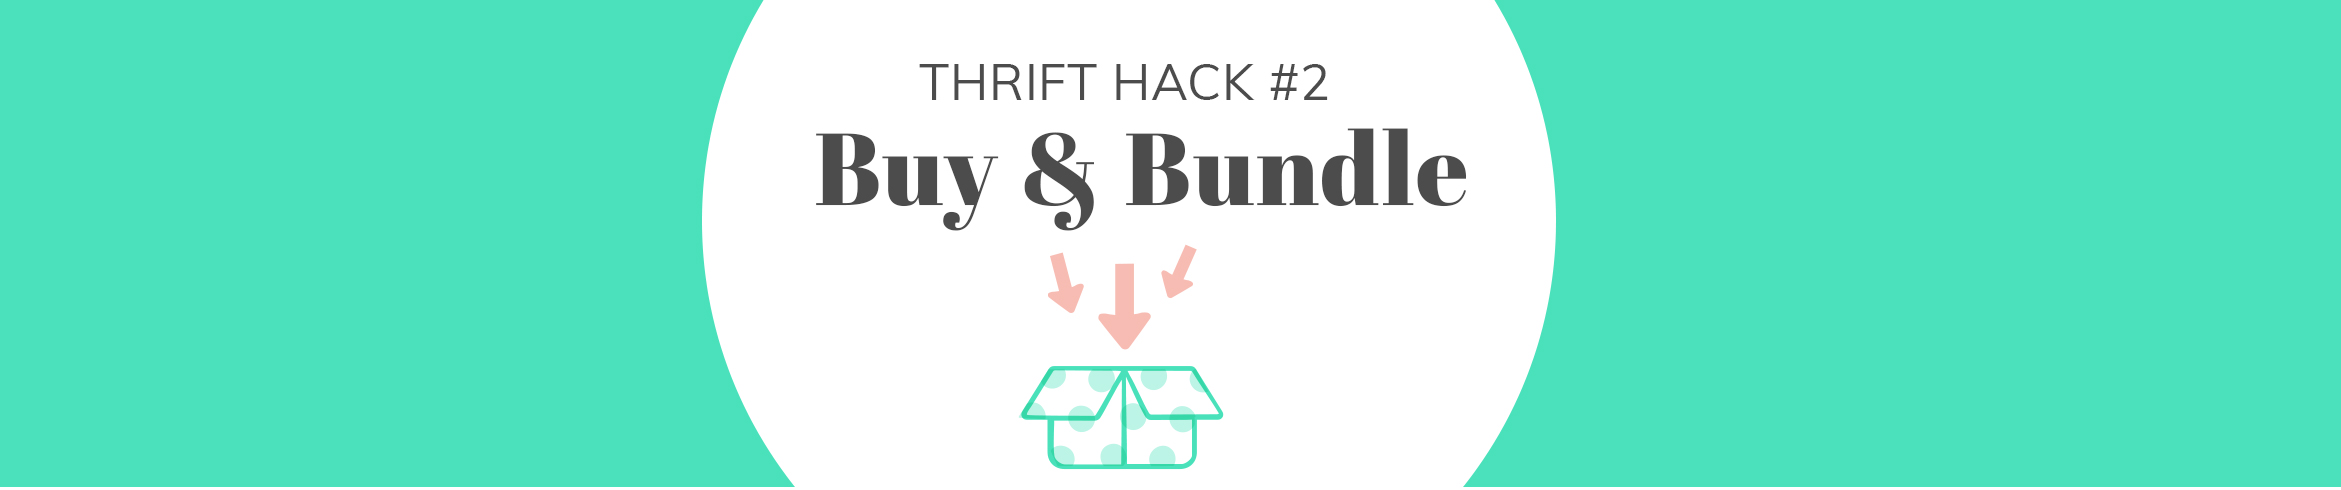 productEducation-thredit-headers-buyBundle